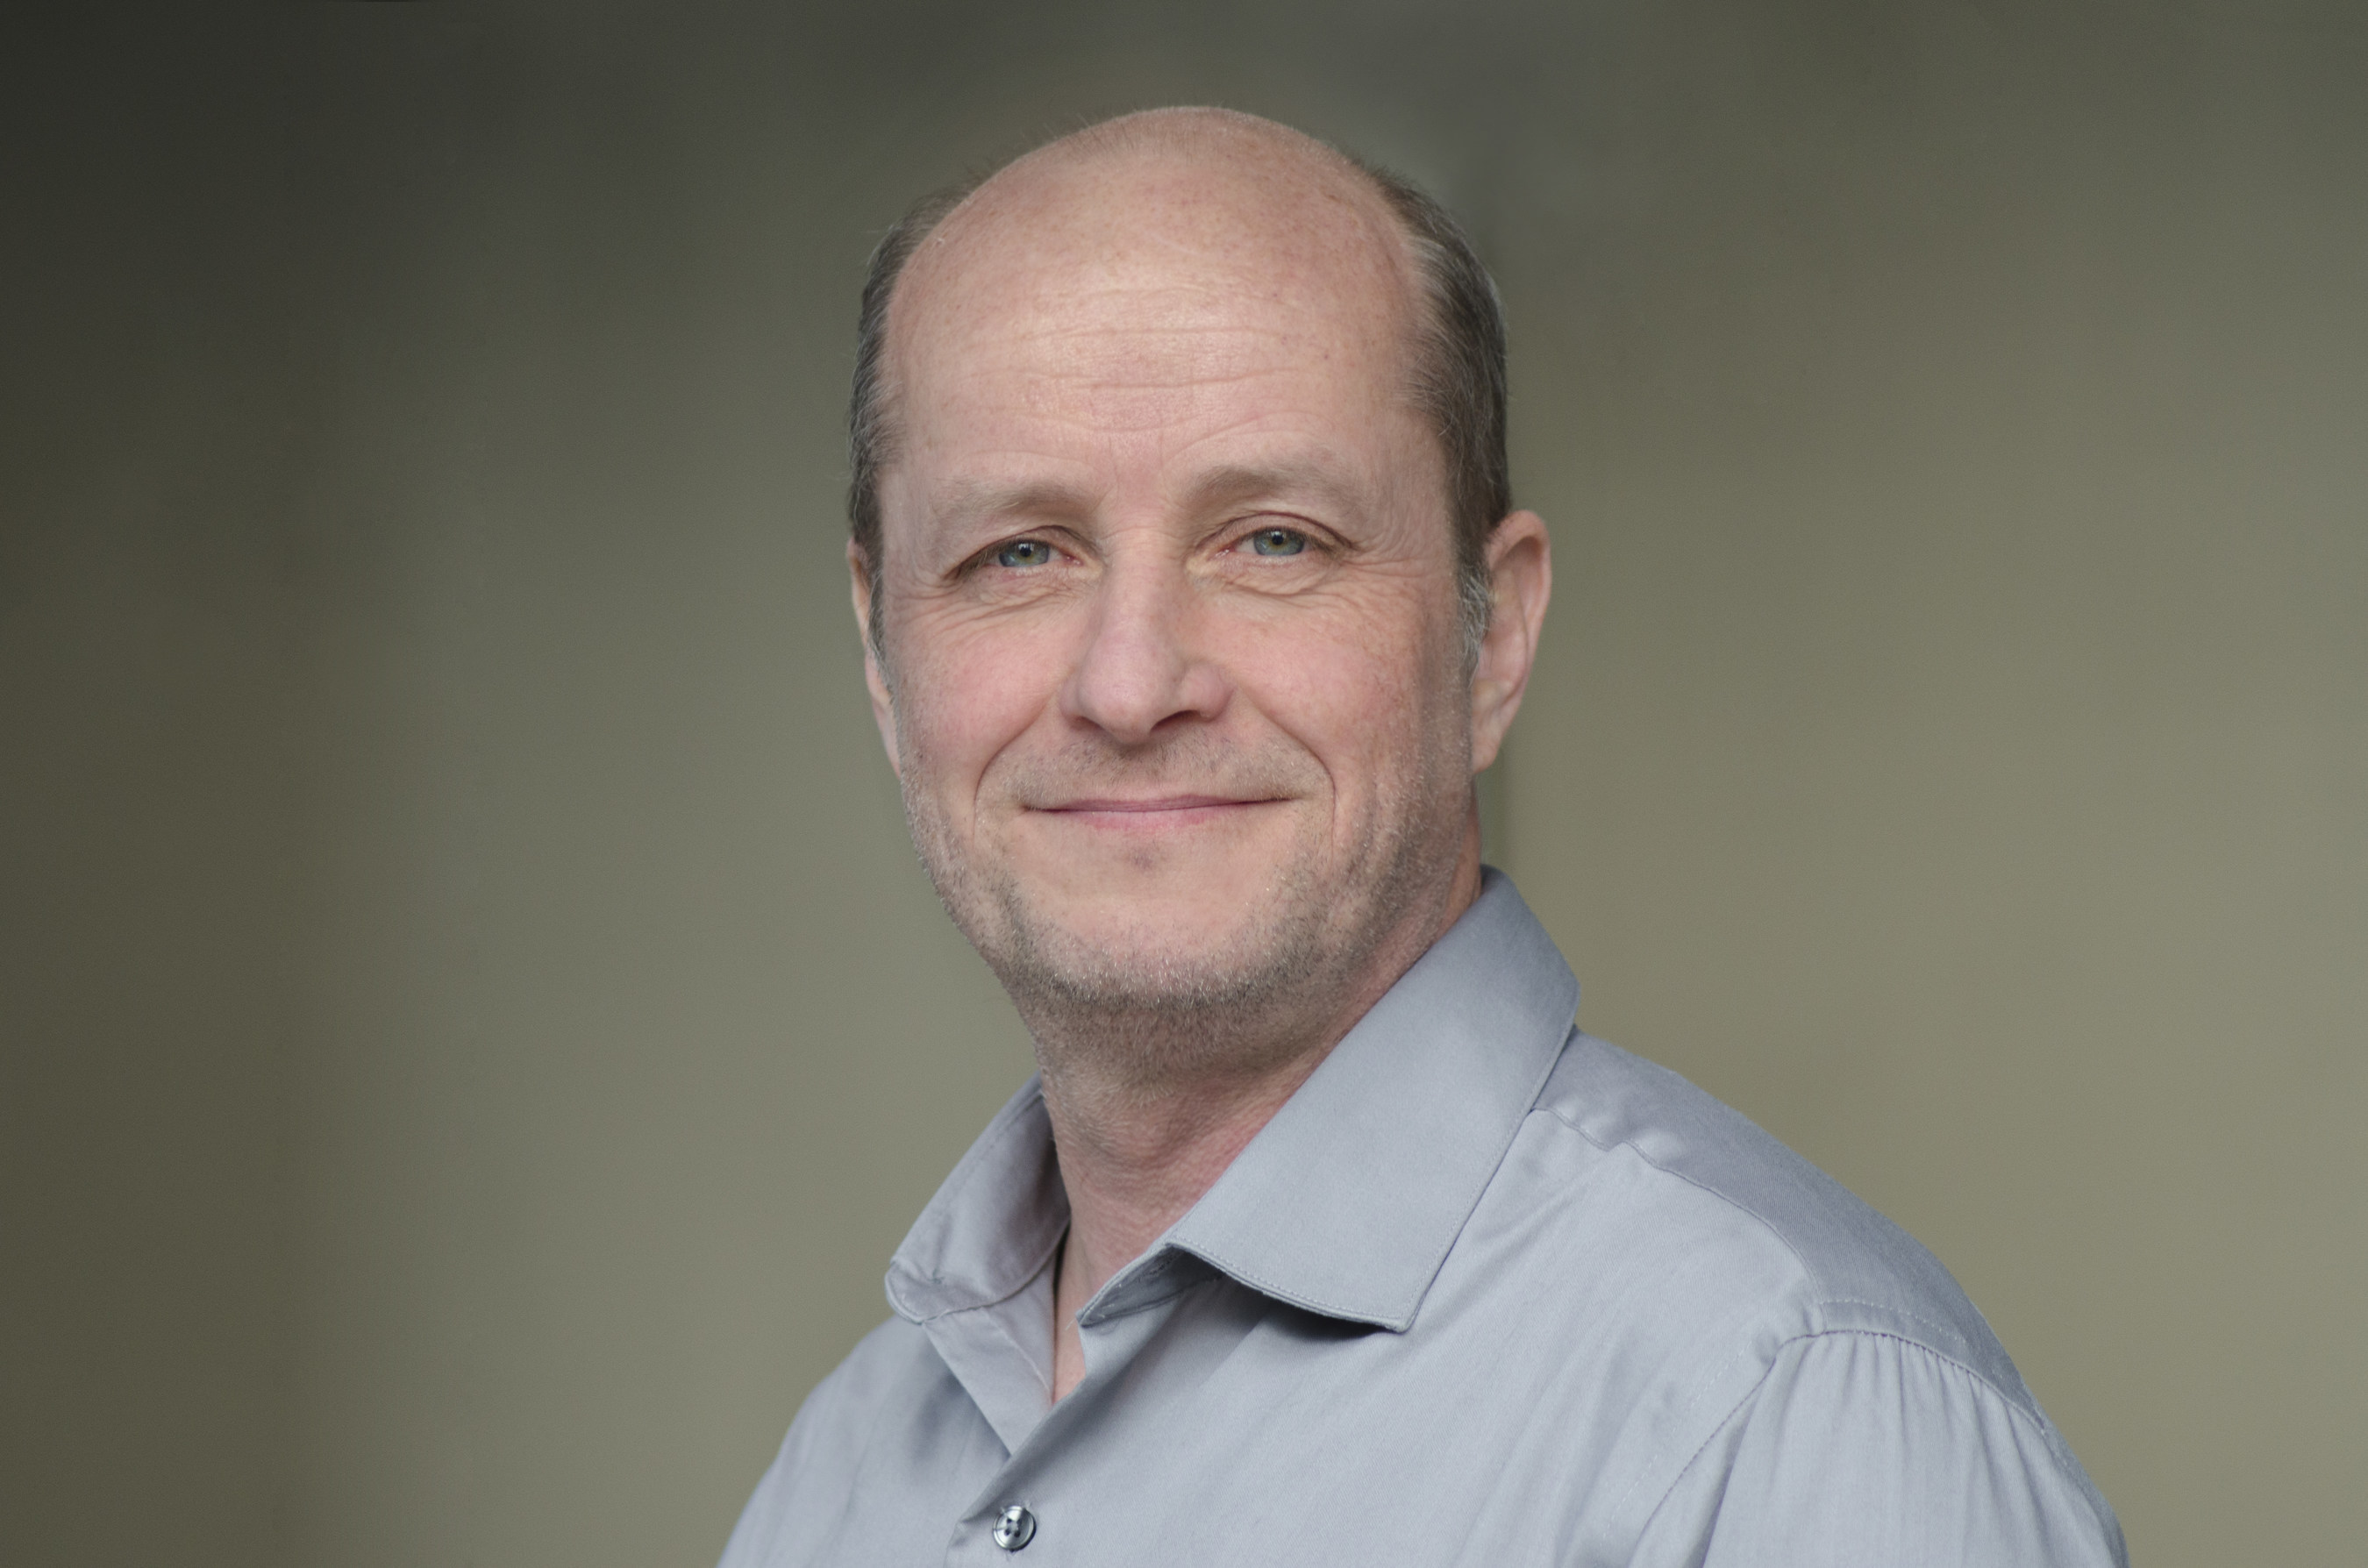 Nintex names Alain Gentilhomme as Chief Technology Officer. www.nintex.com